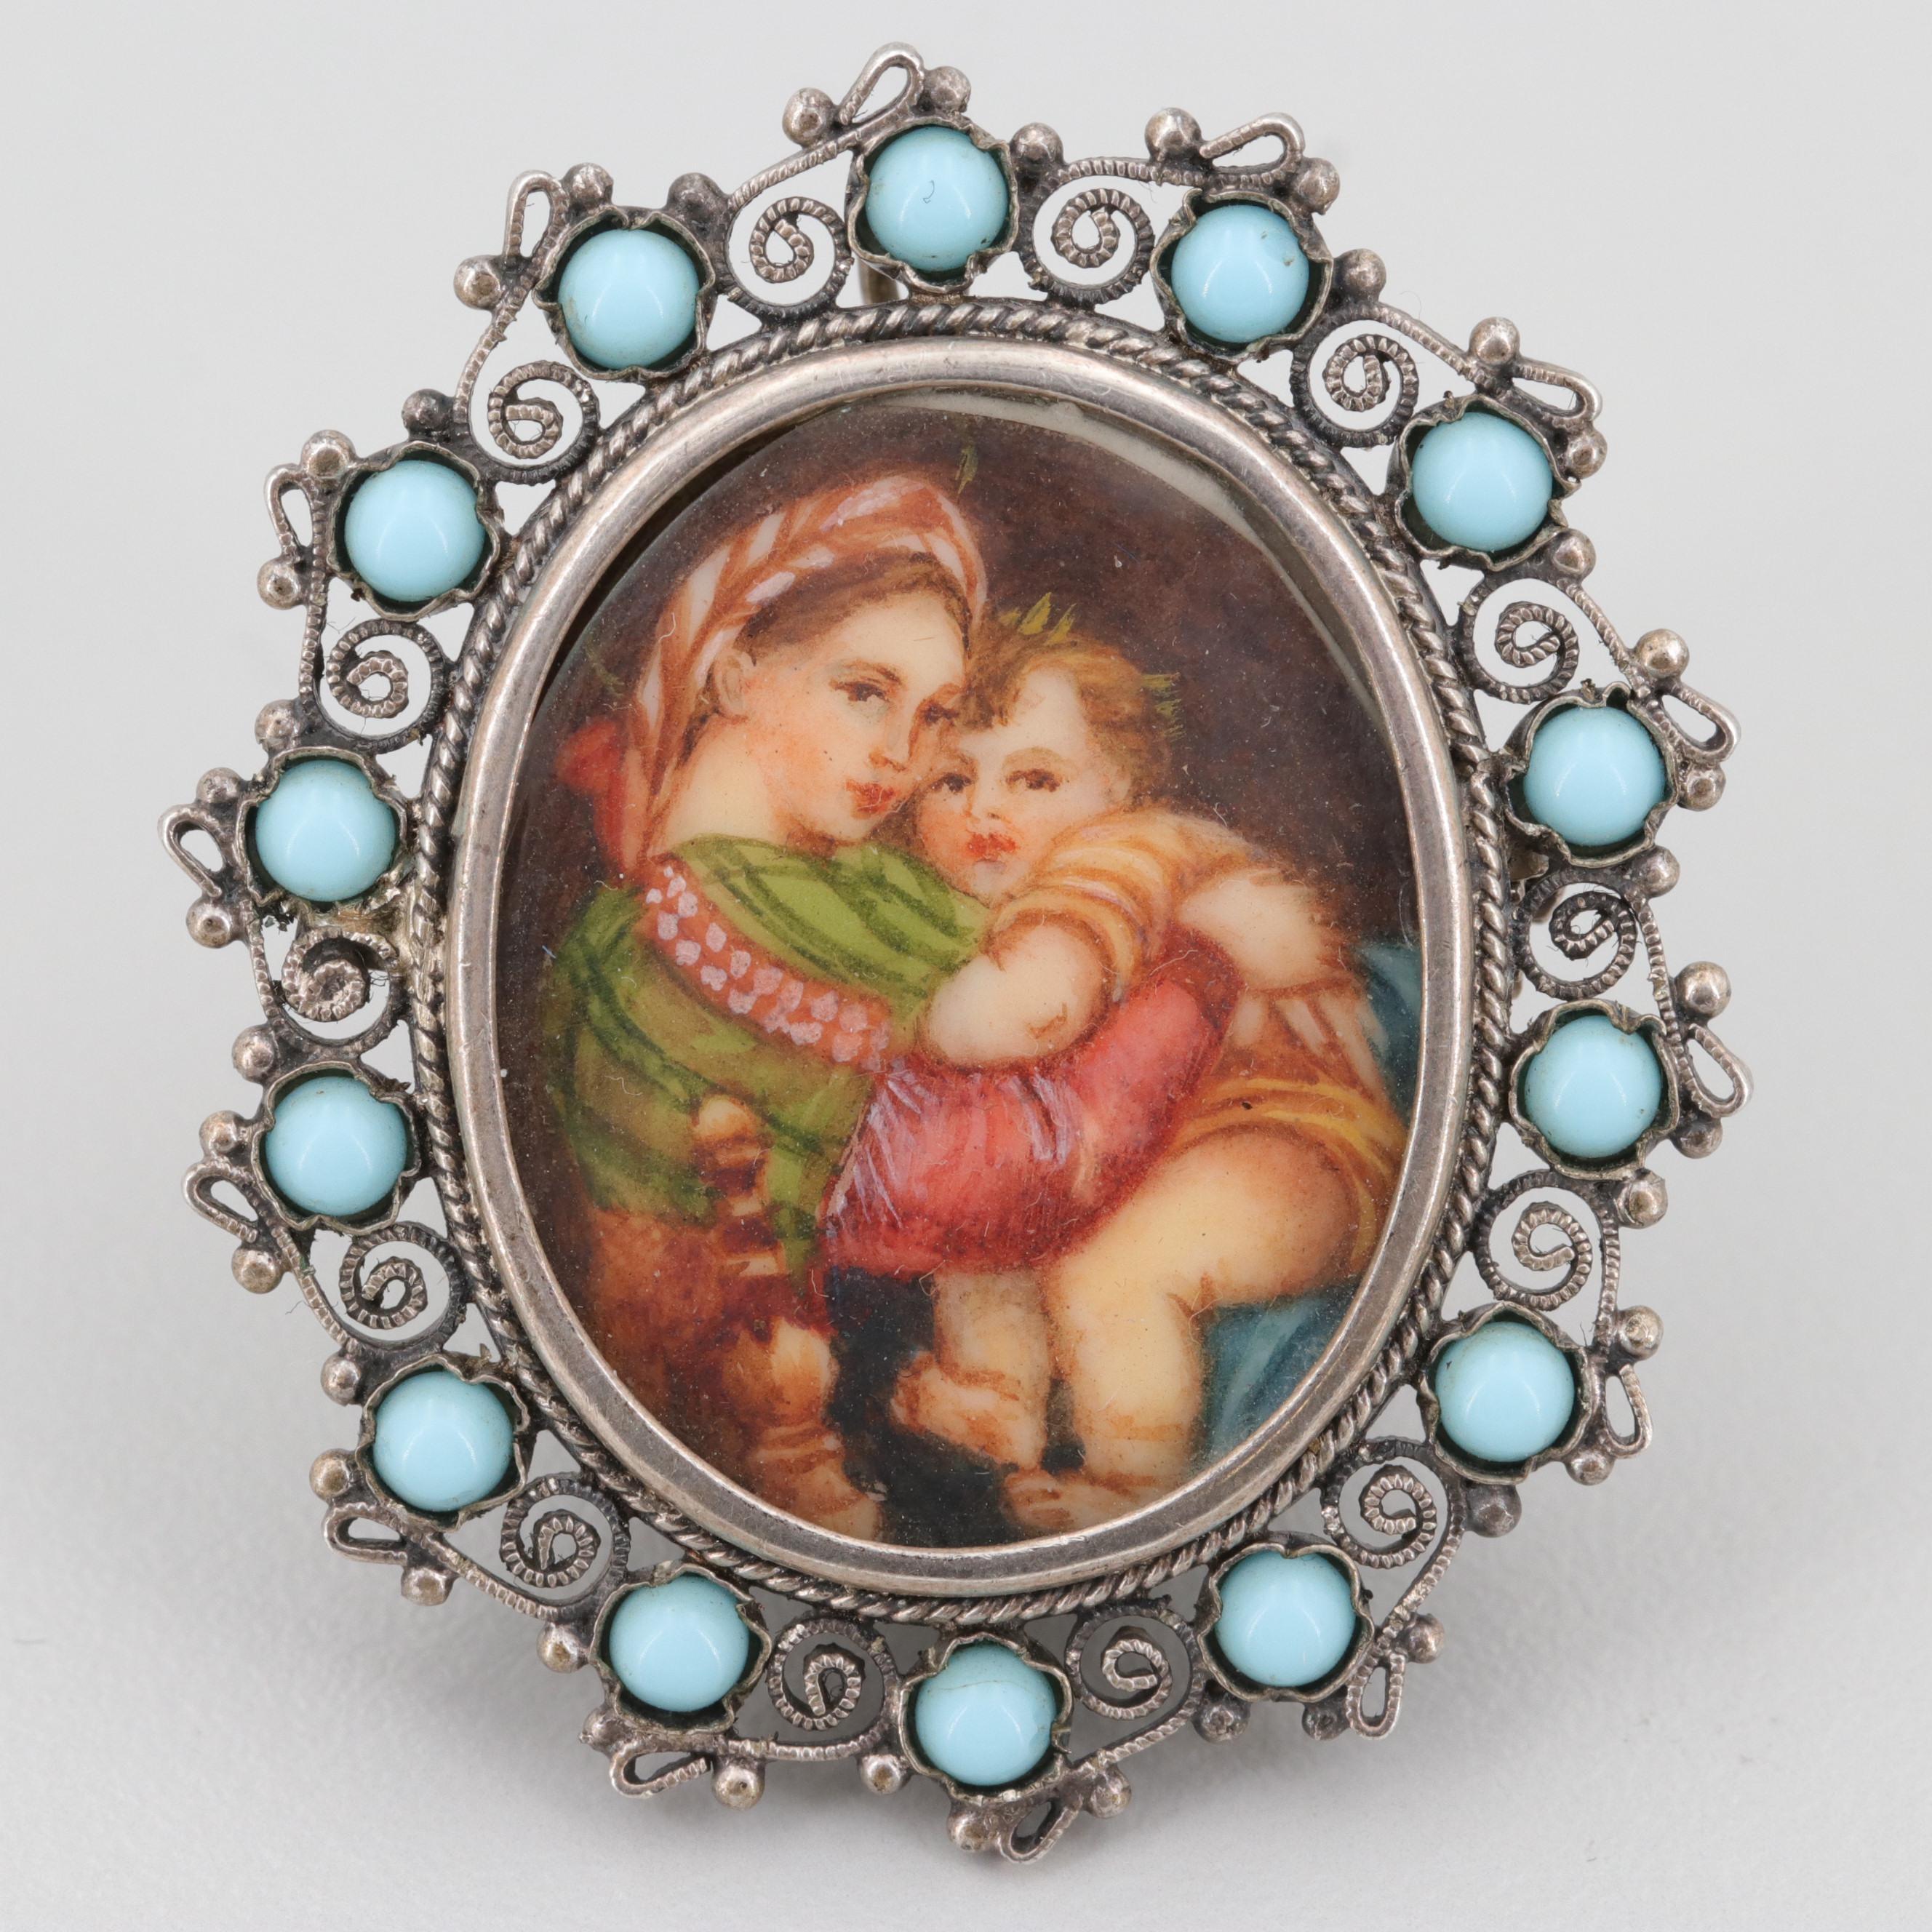 Vintage 800 Silver Turquoise Miniature Portrait Converter Brooch